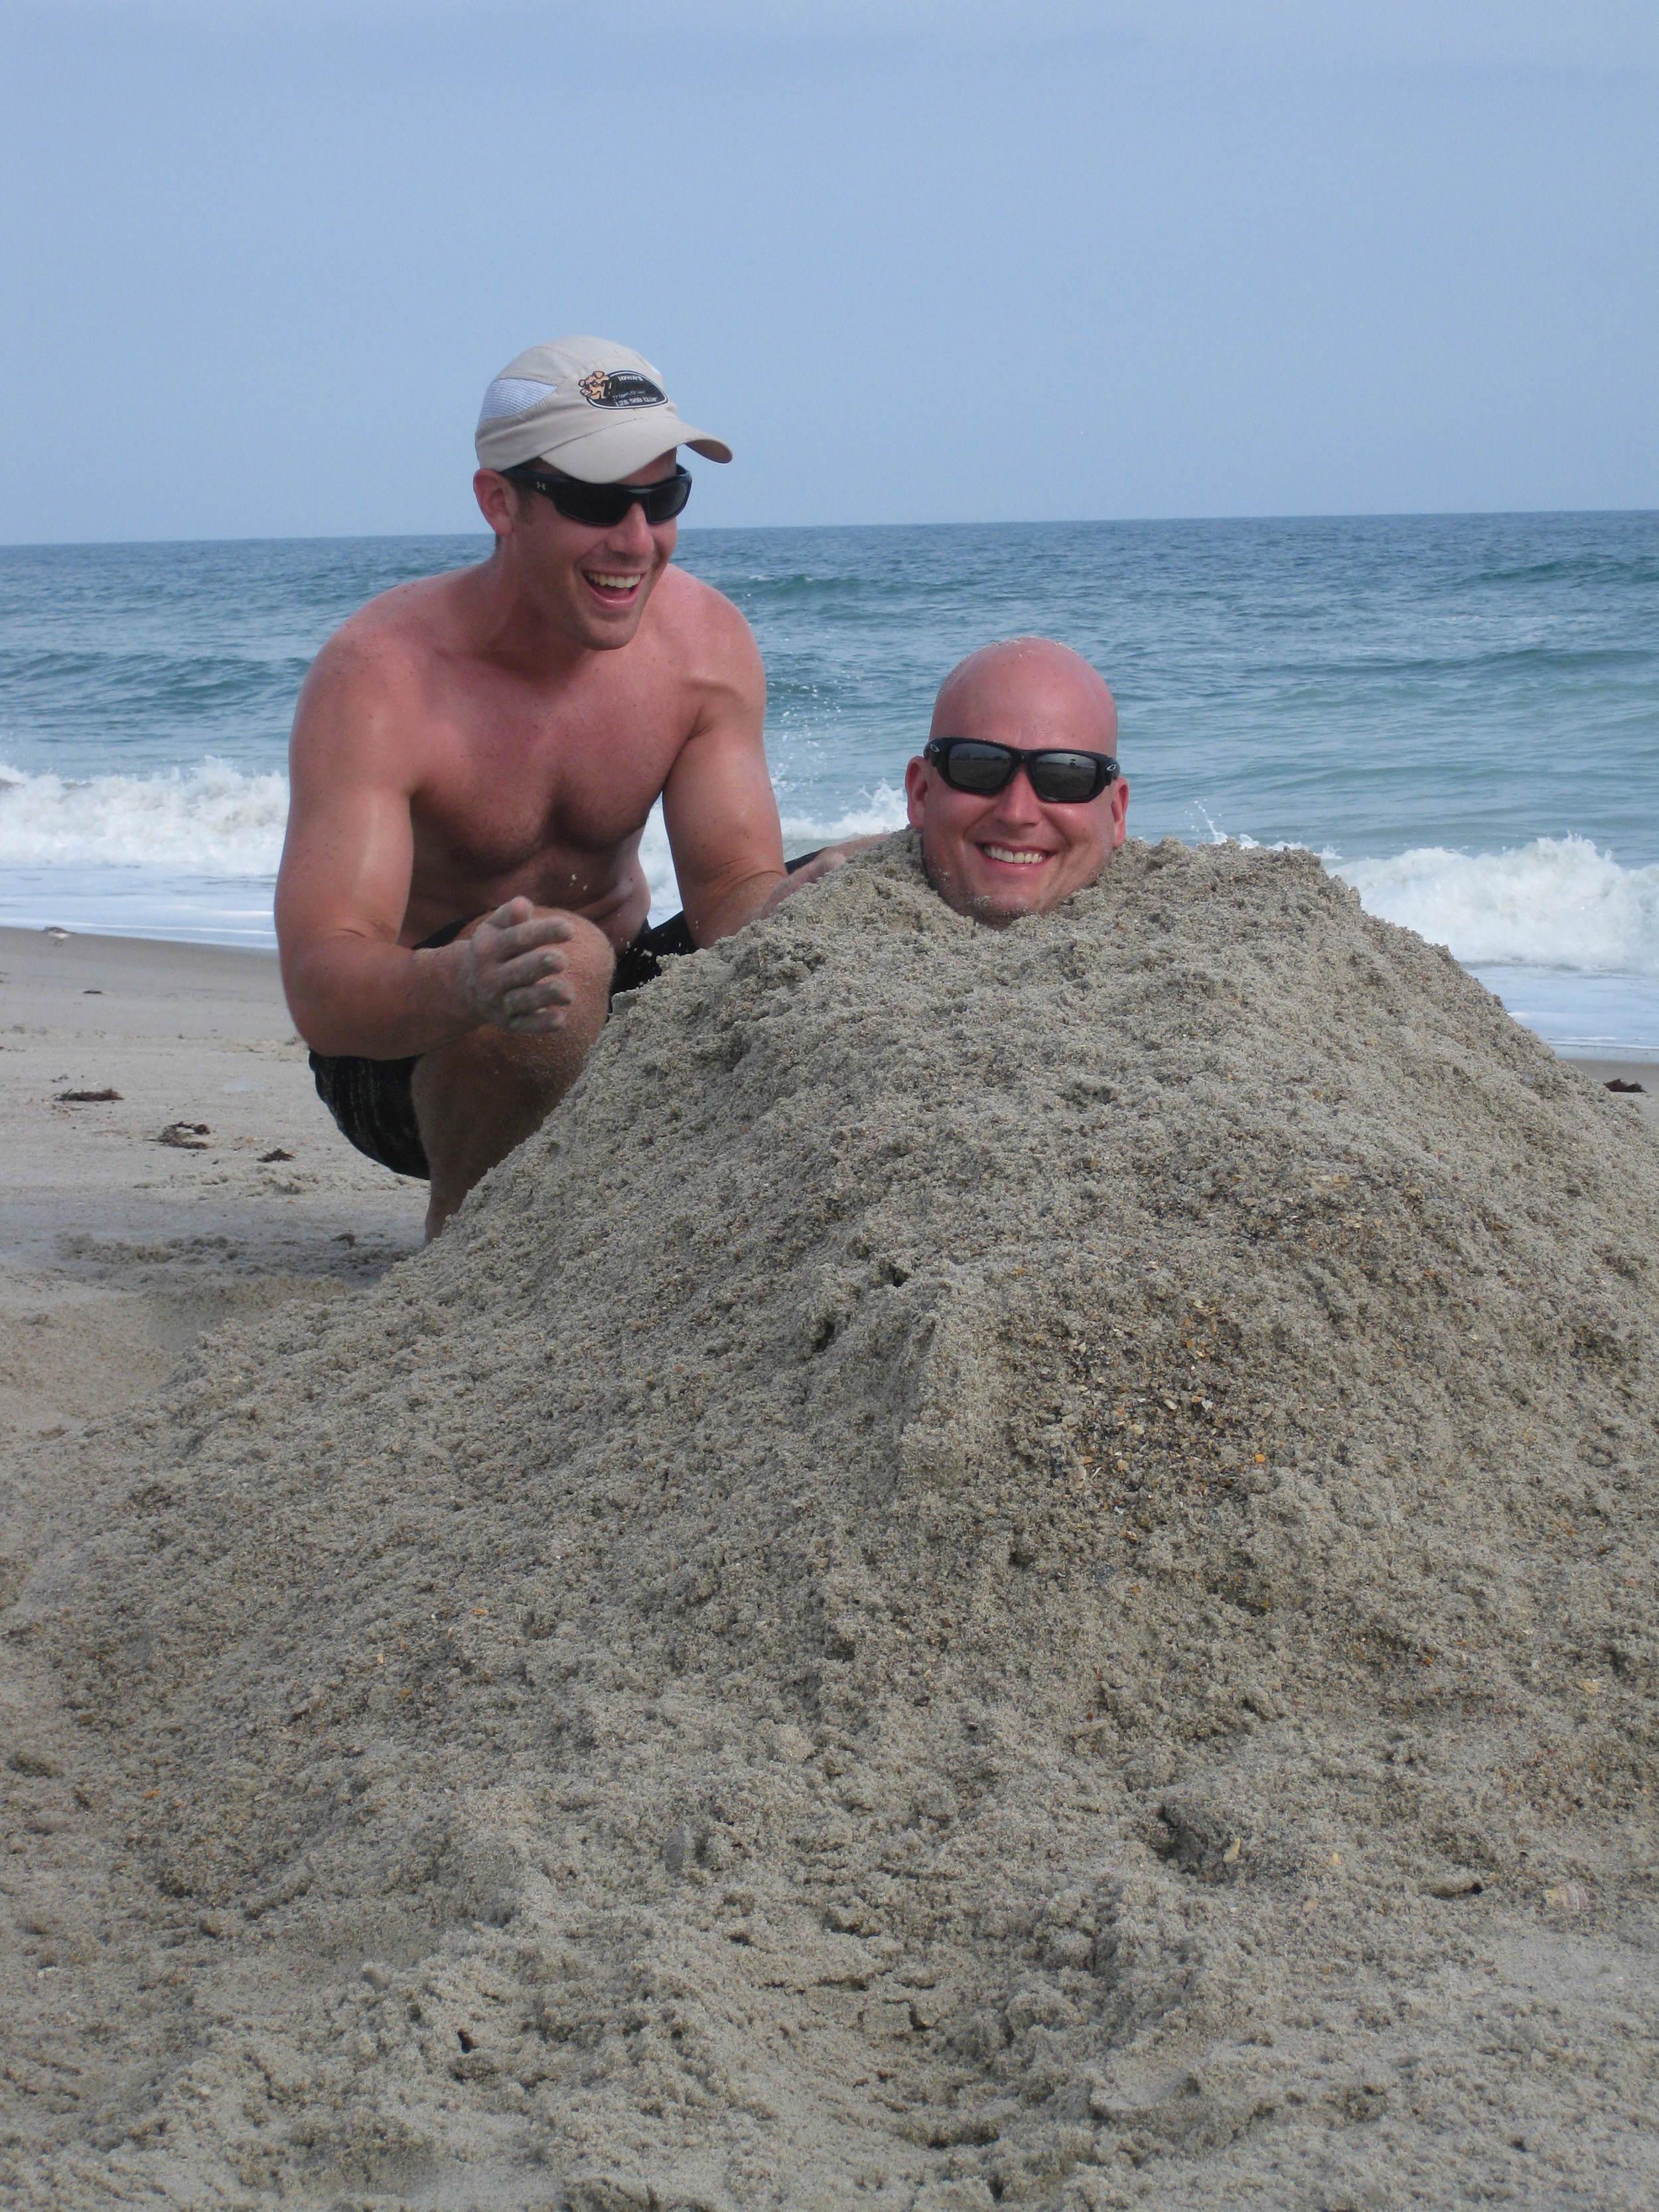 Burying_Andy_in_sand_at_beach.JPG